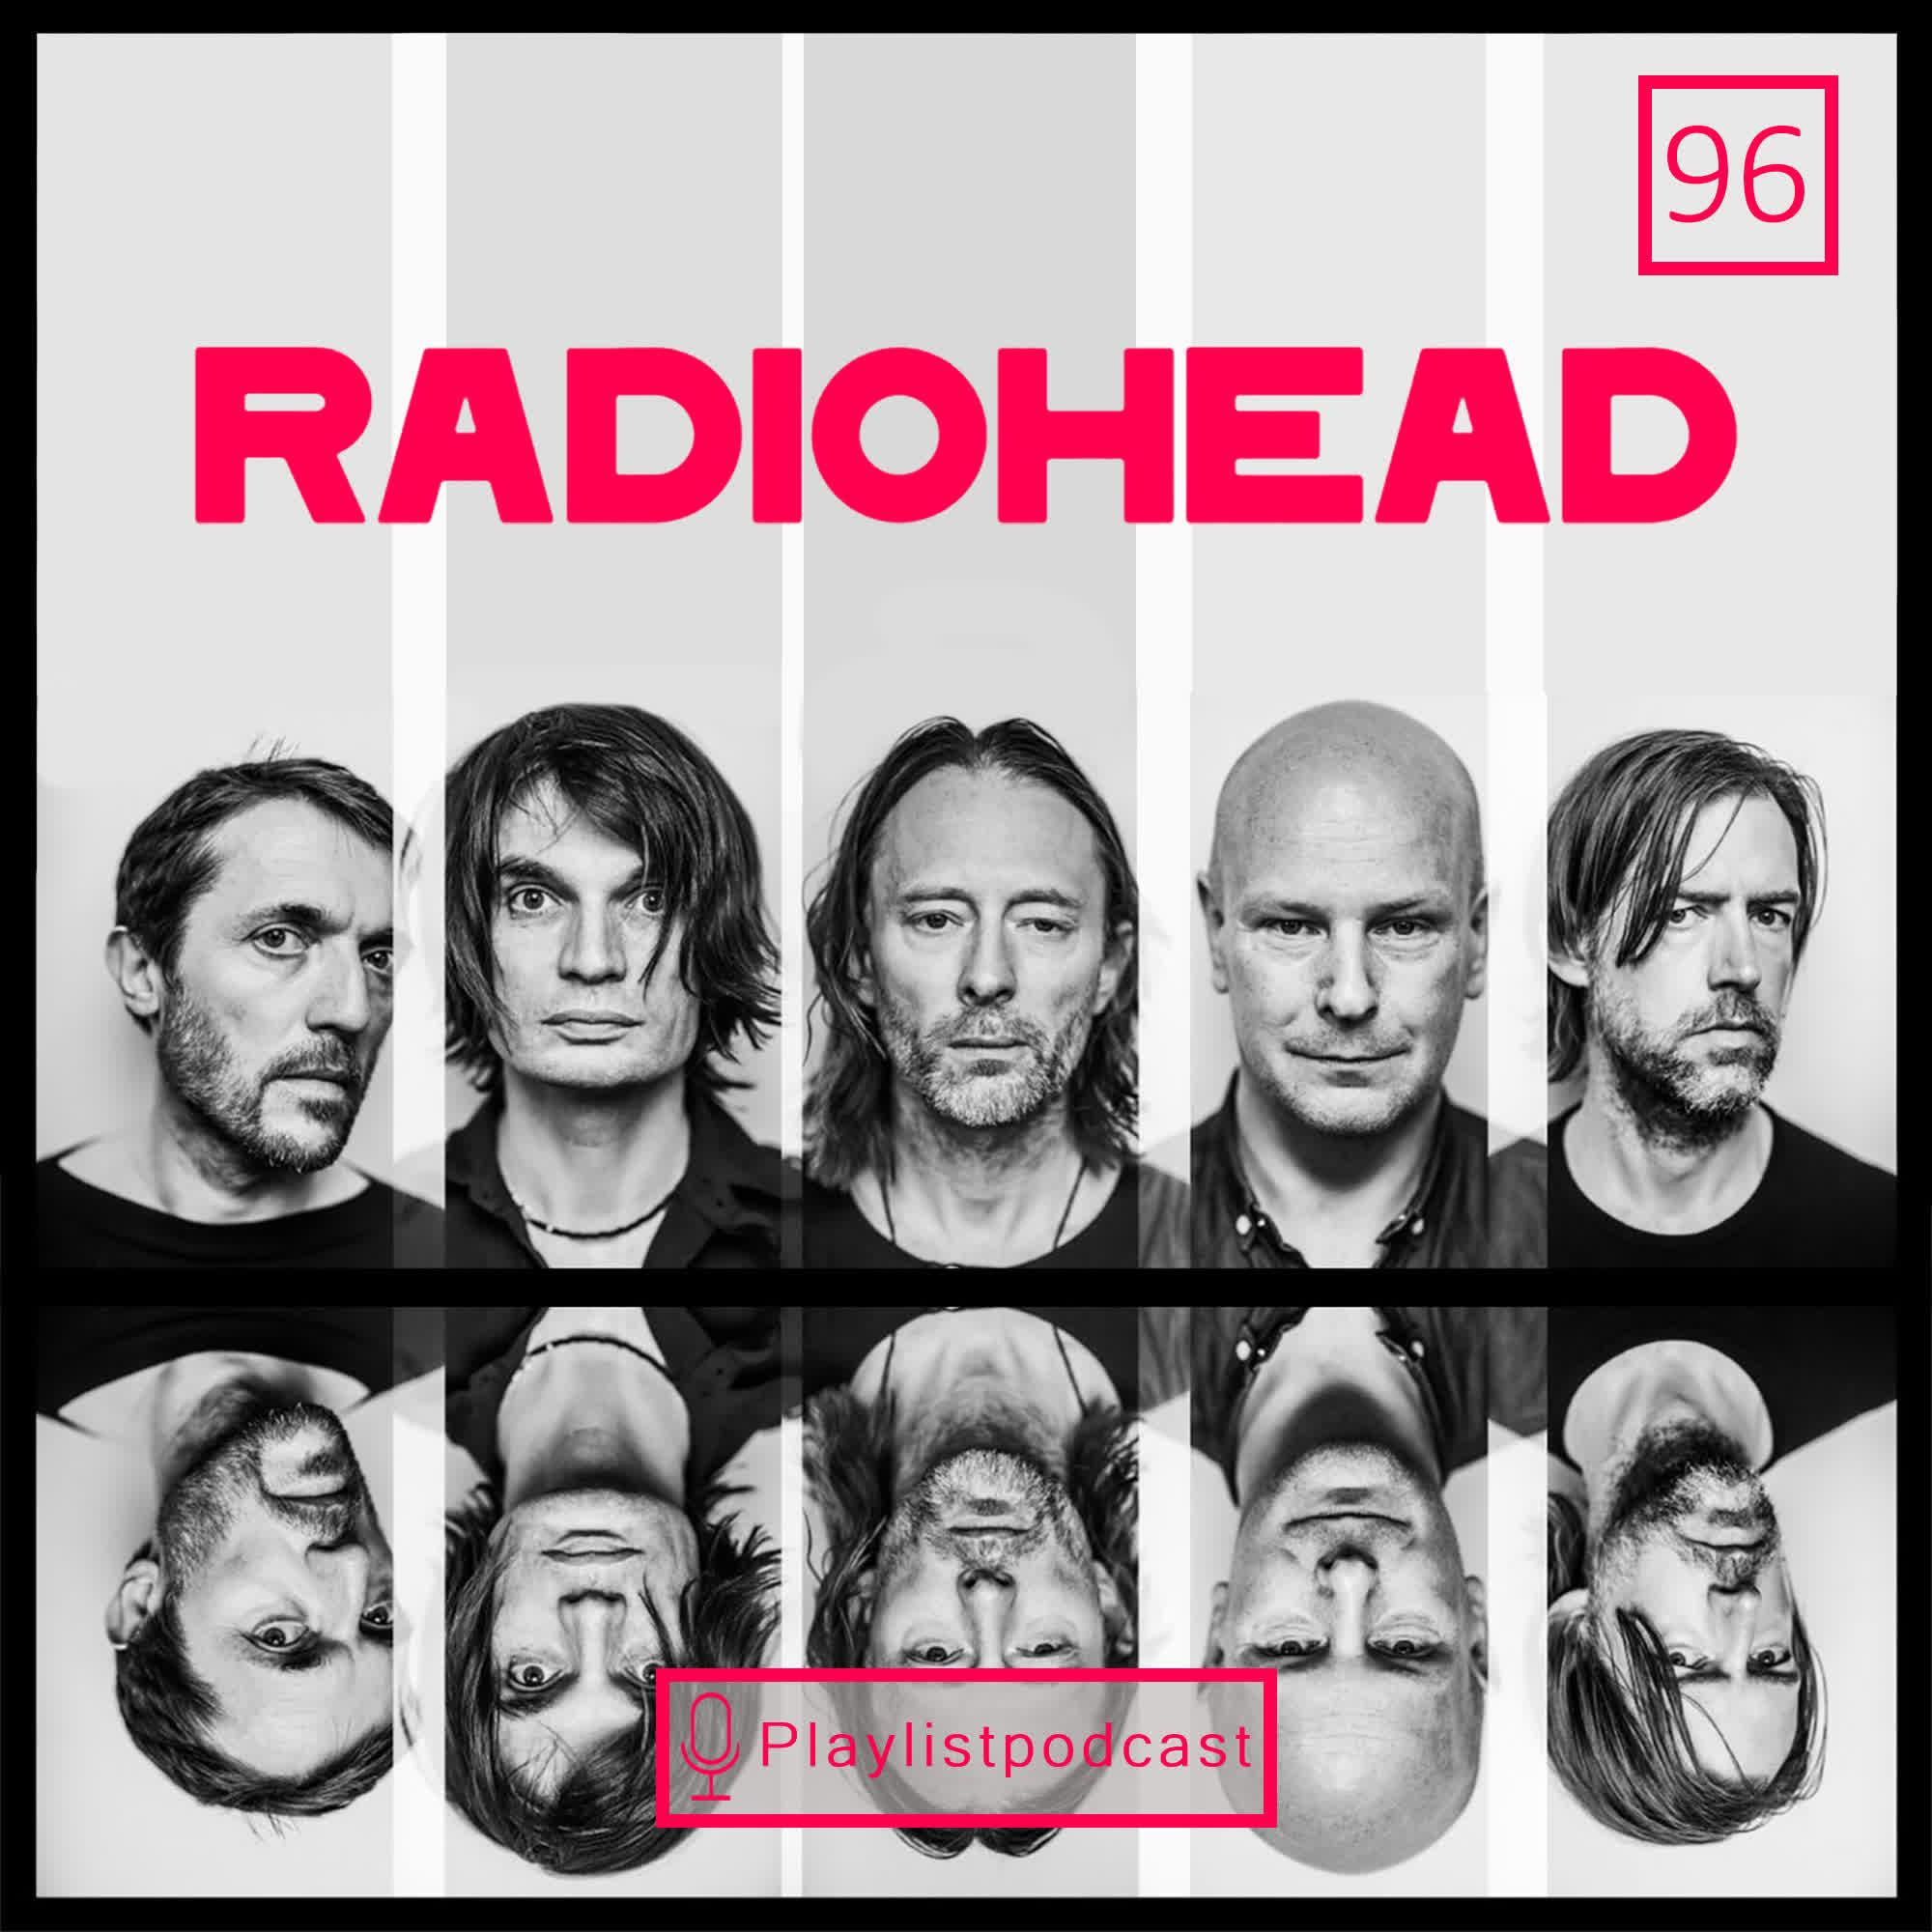 LIVE 96 - RadioHead - پلی لیست لایو